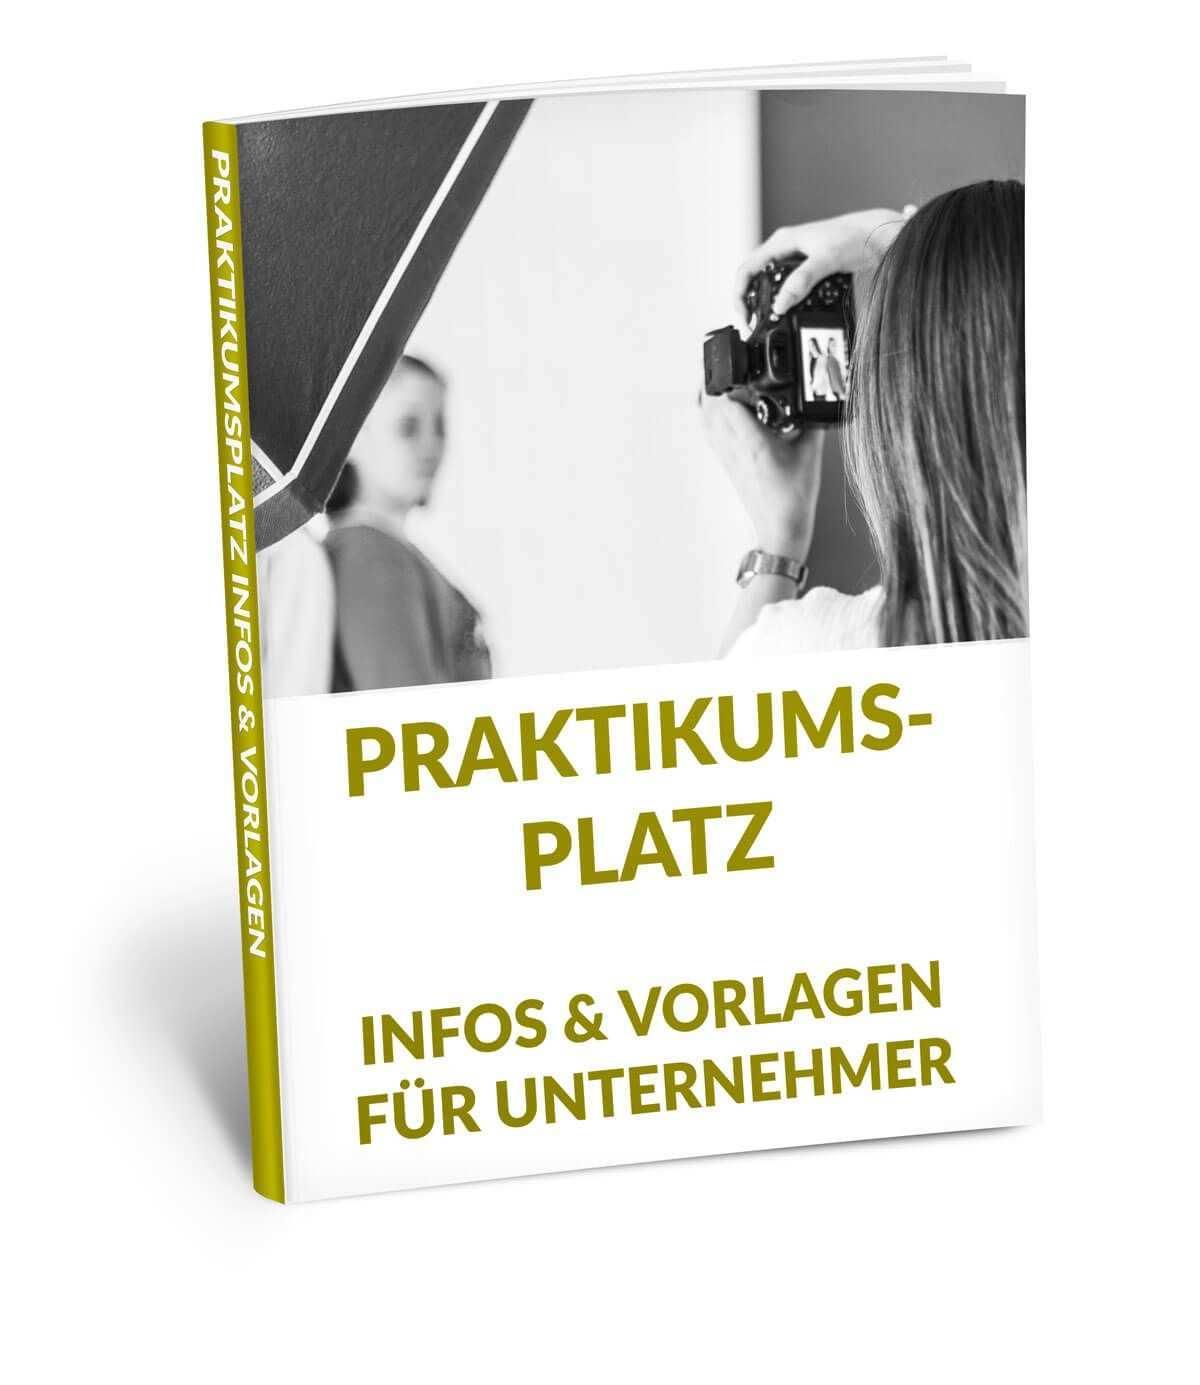 Praktikumsplatz Infos Vorlagen Fur Betriebe Selbstandige Praktikumsvertrag Vertrag Zeugnis Praktikumszeugnis Digital Zeugnis Fotokurs Hamburg Vorlagen